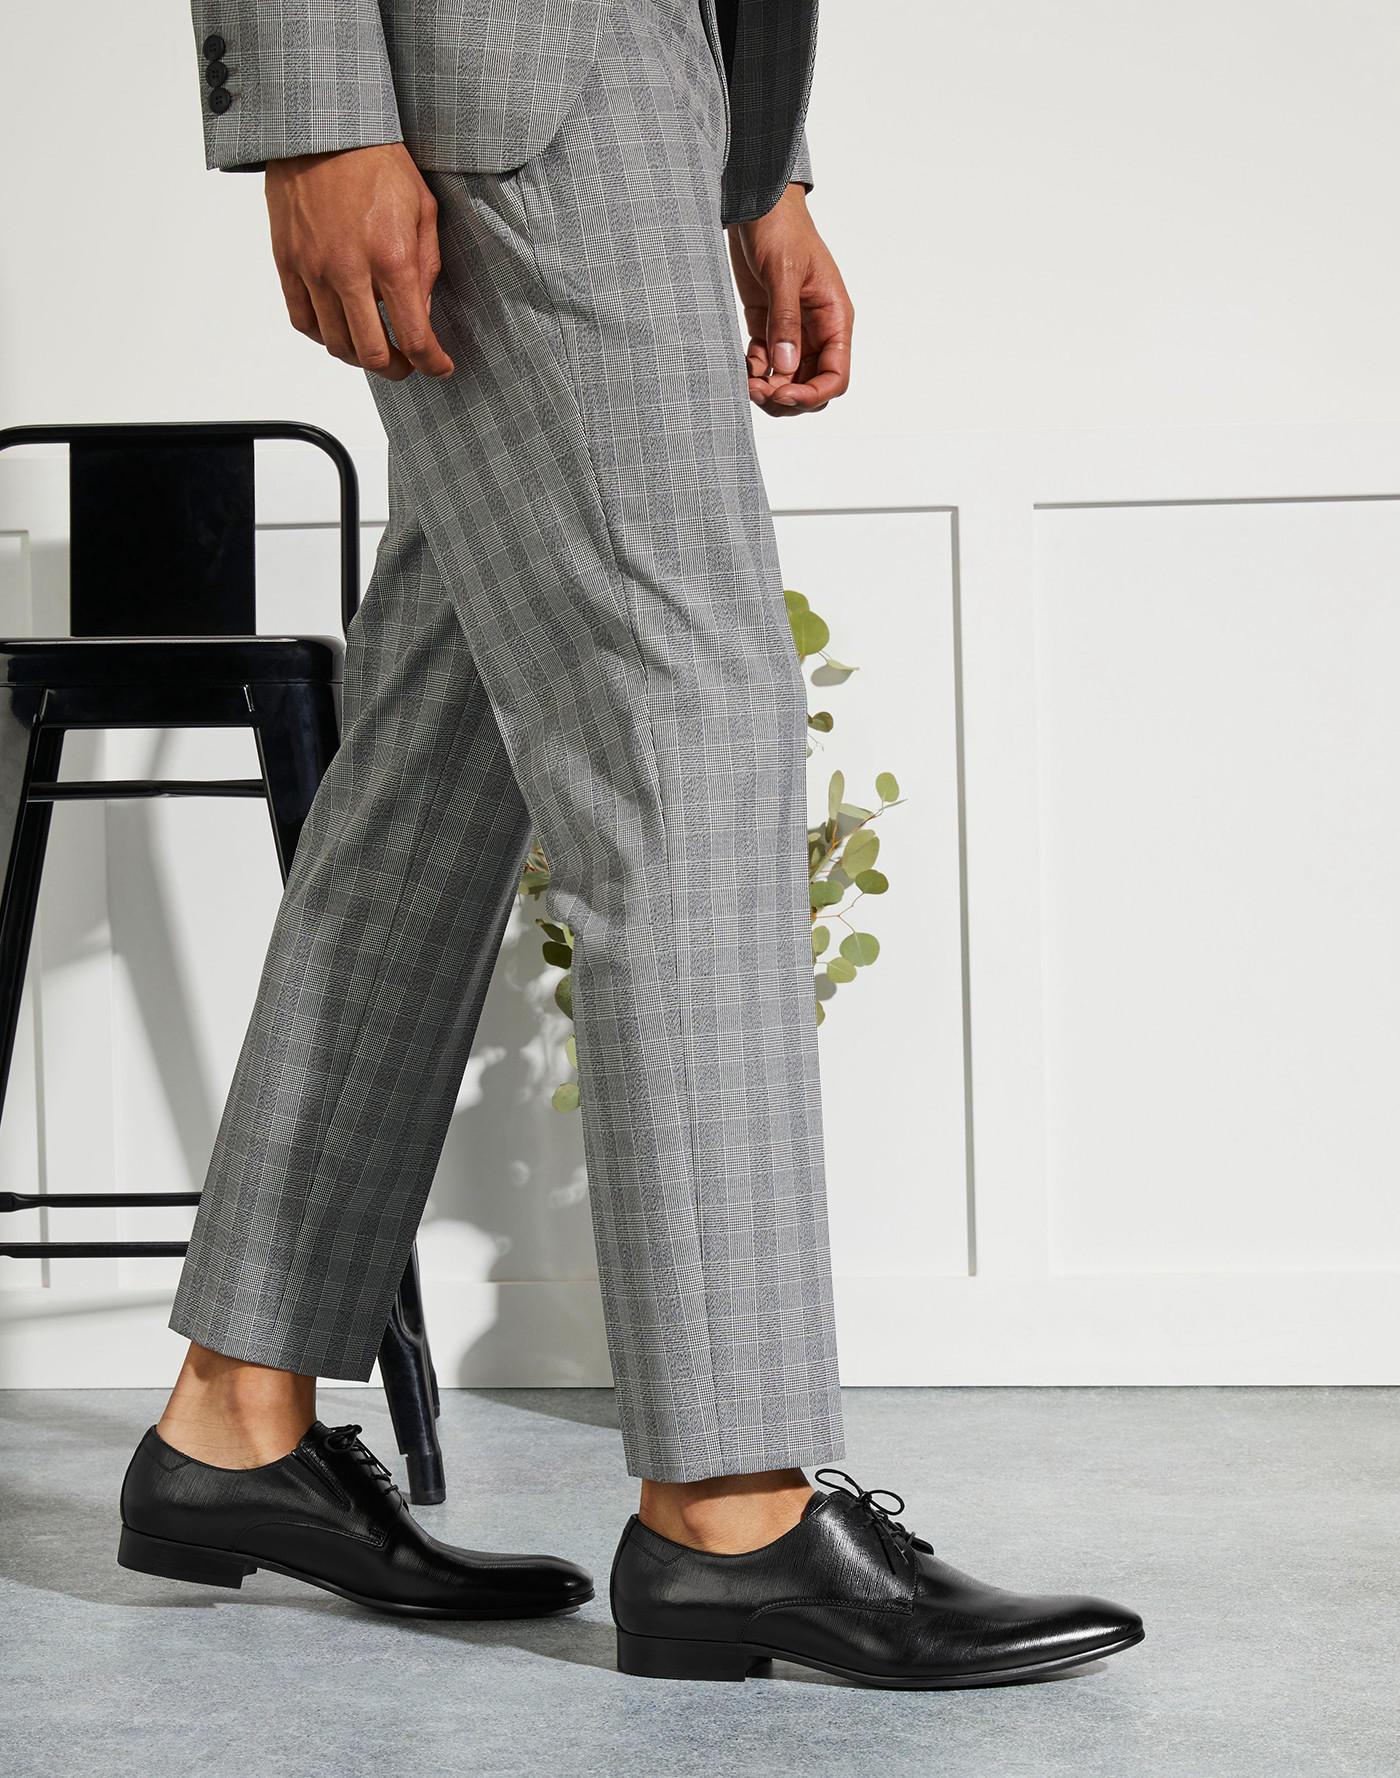 Catalogo Vestir Casual 2016 Price Shoes